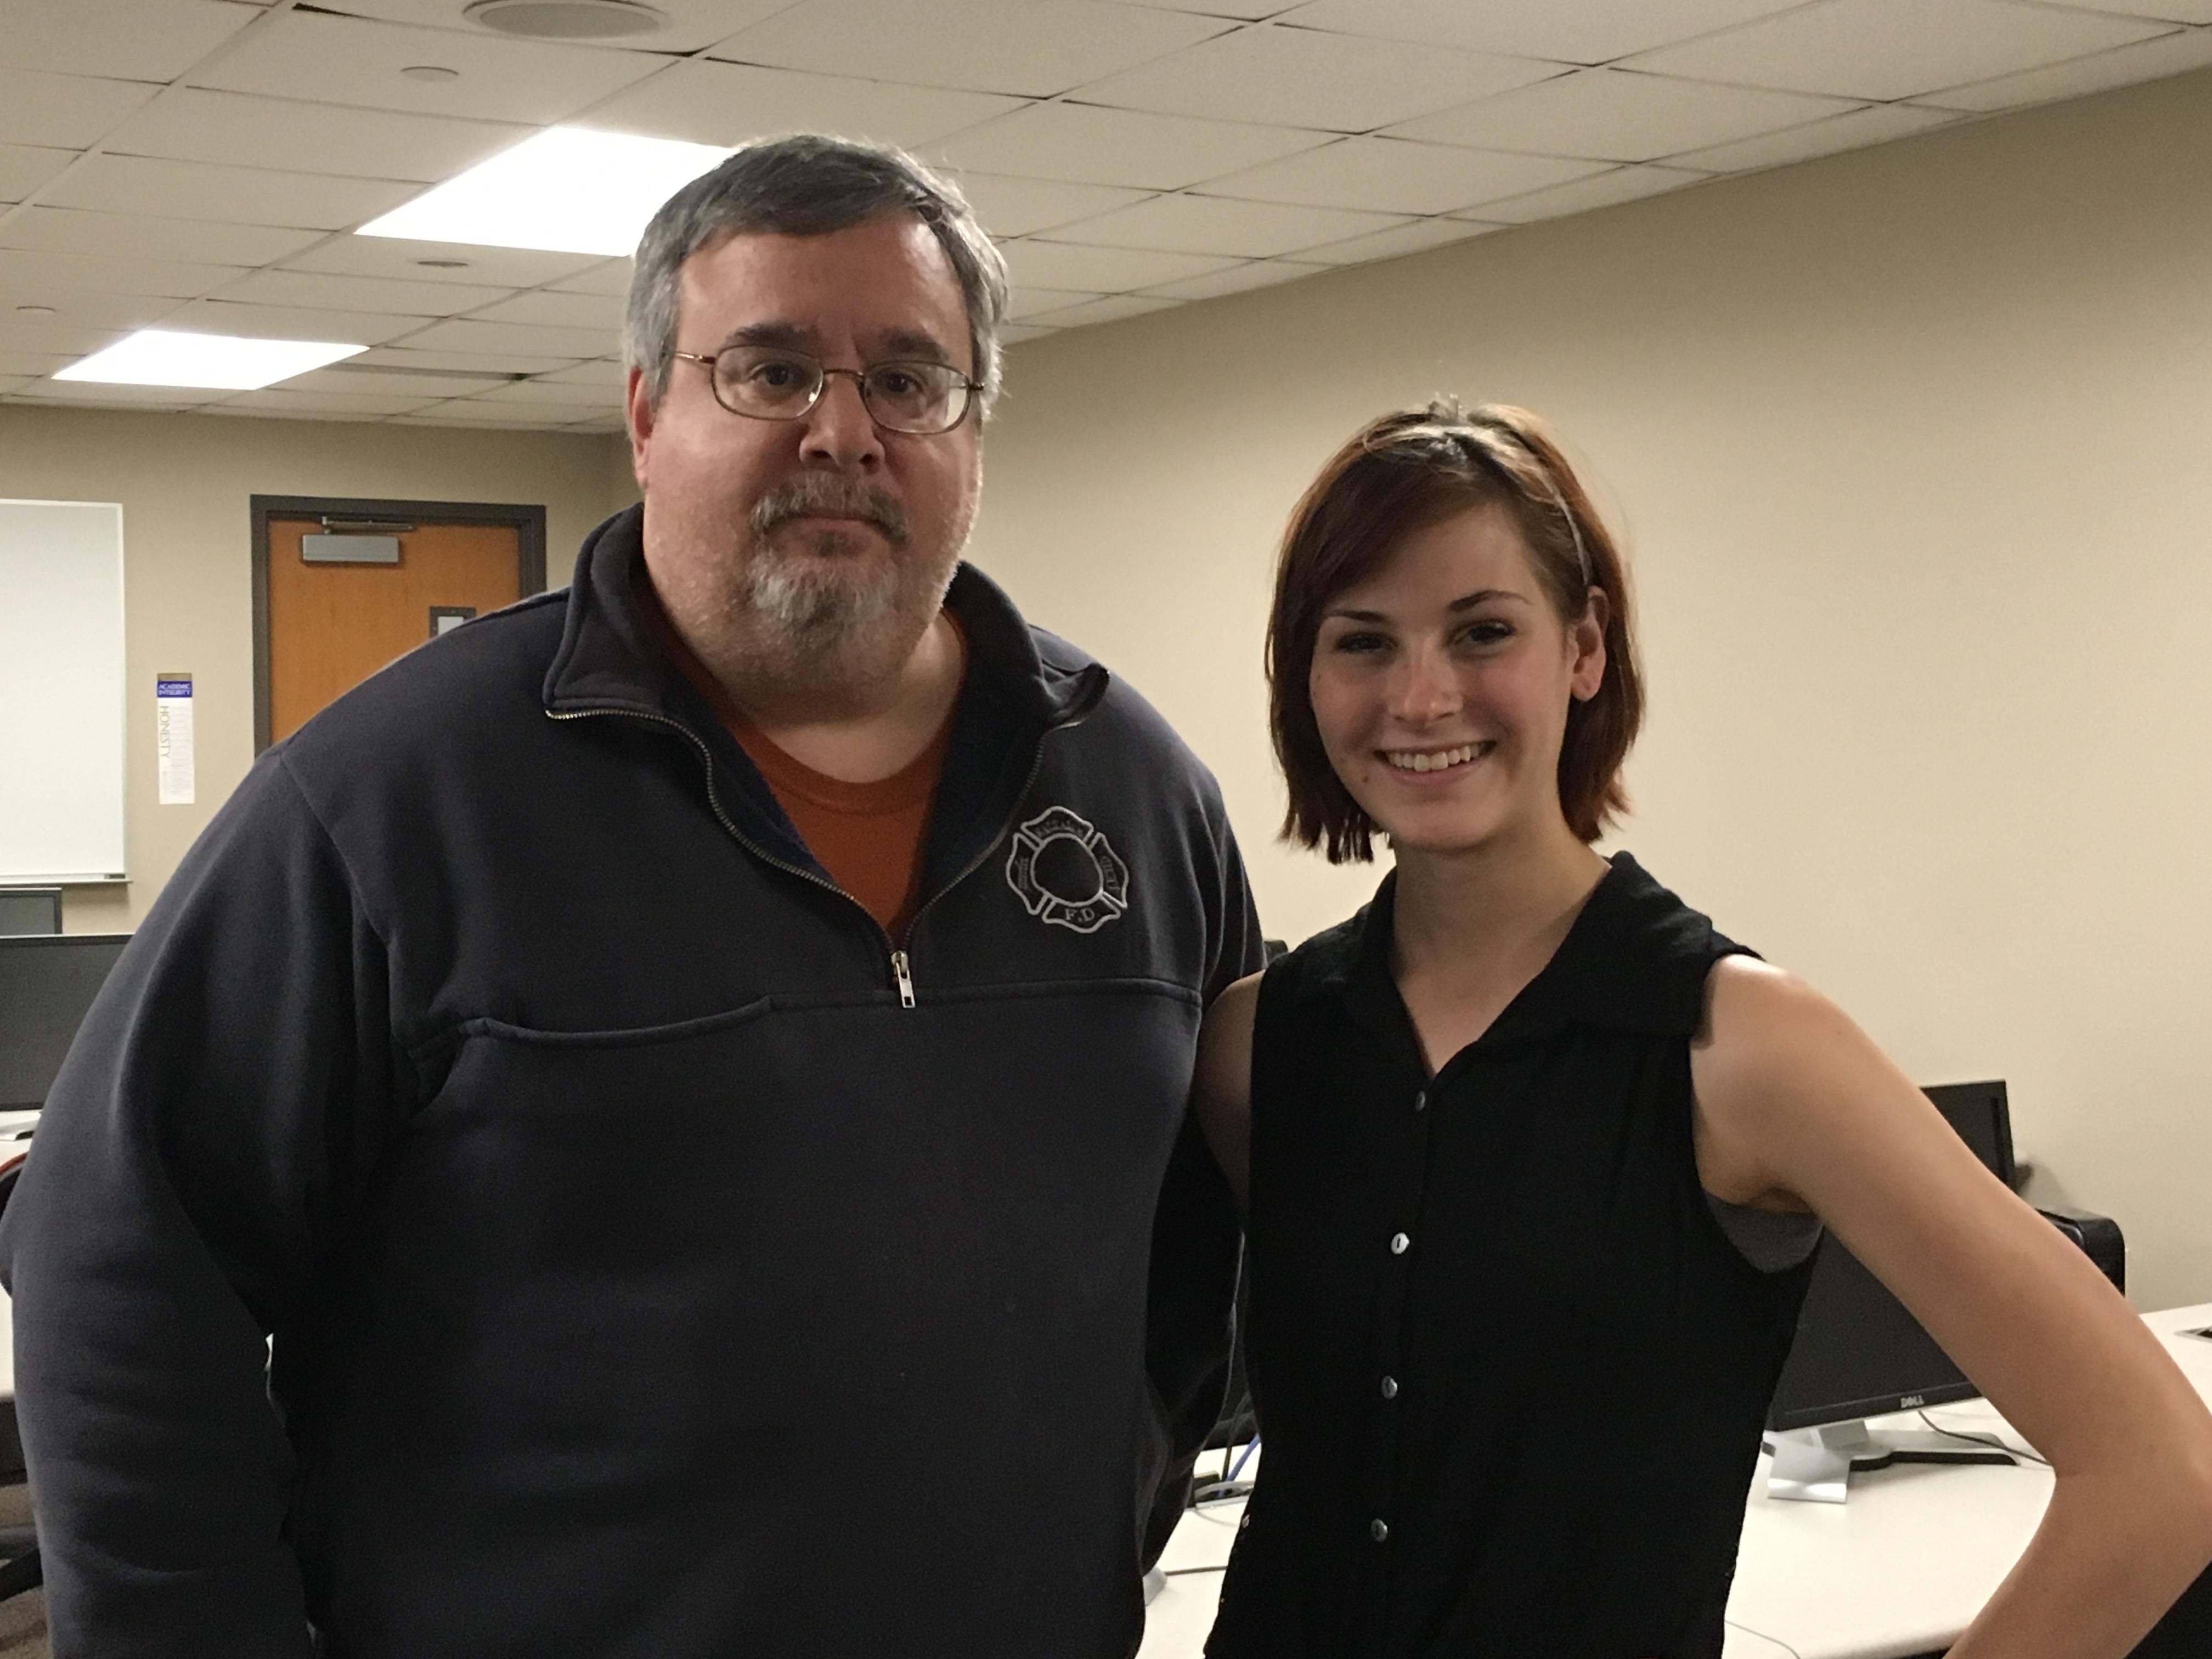 Allison Kelly and Paul Shapiro